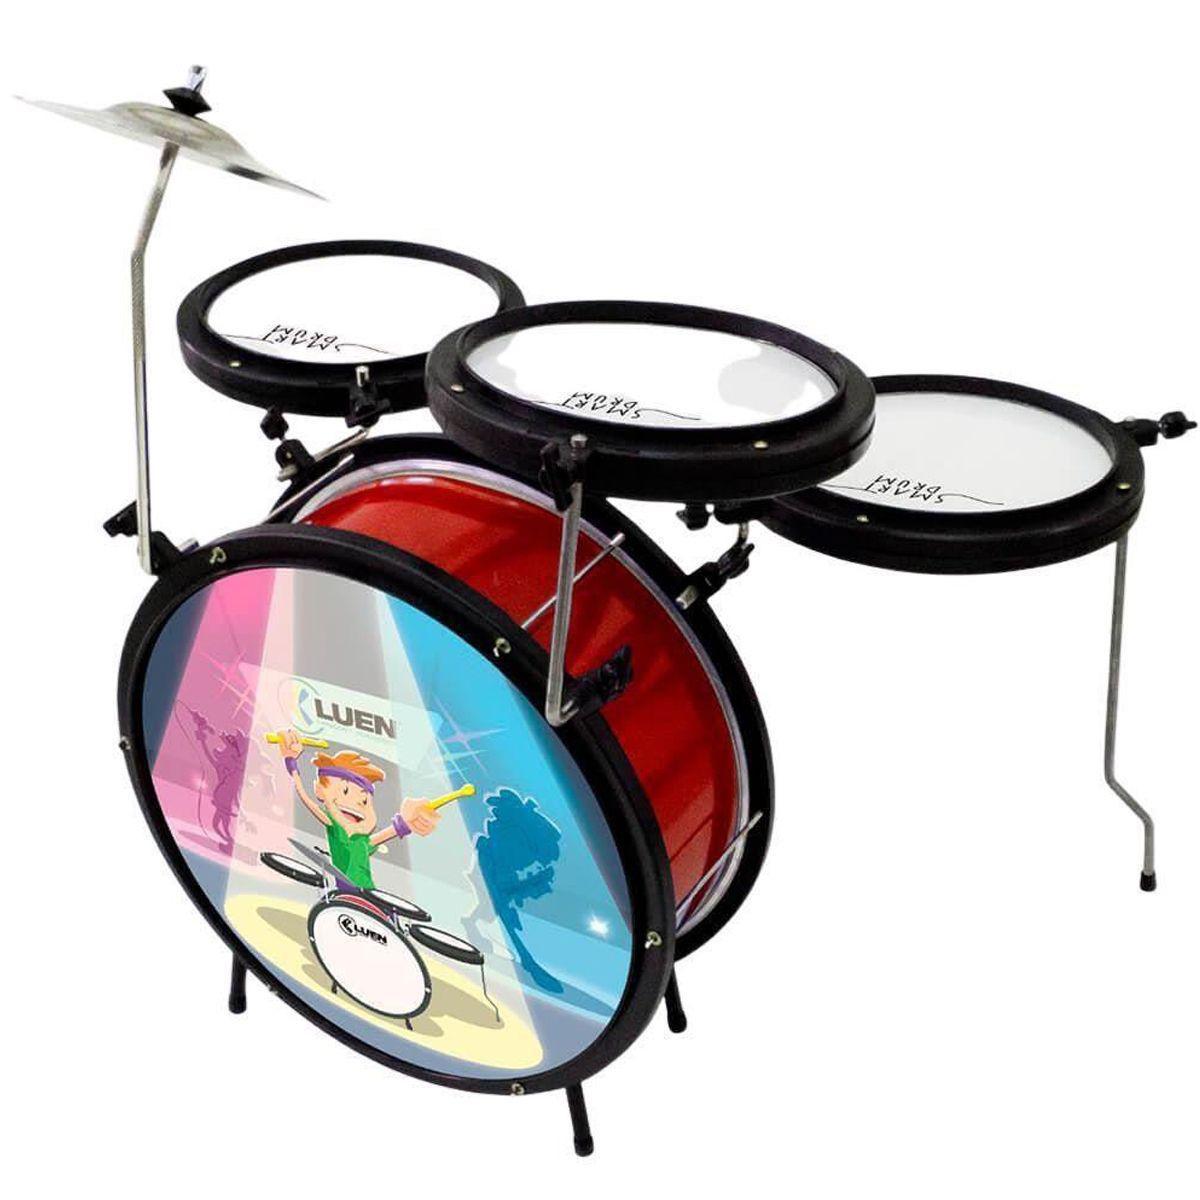 Bateria infantil Smart Drum VERMELHA - Luen 44007VM